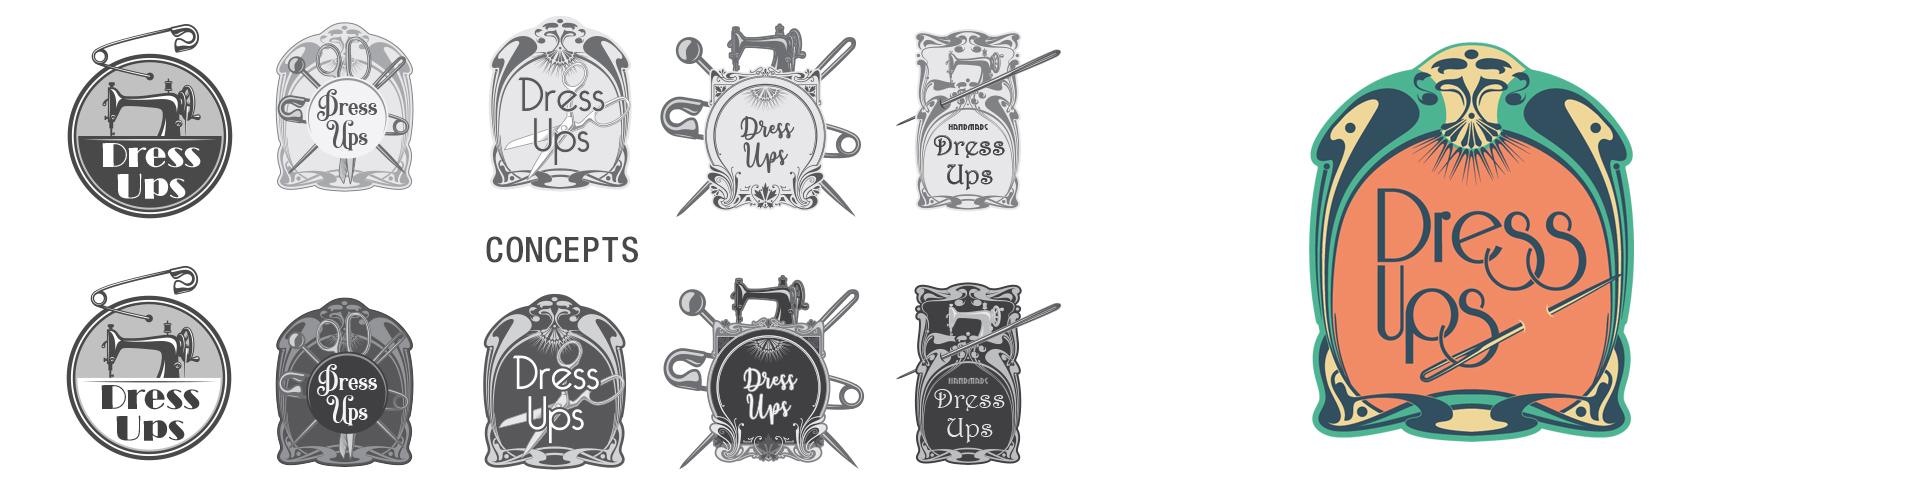 Dress Ups Logo - a costume seamstress startup company